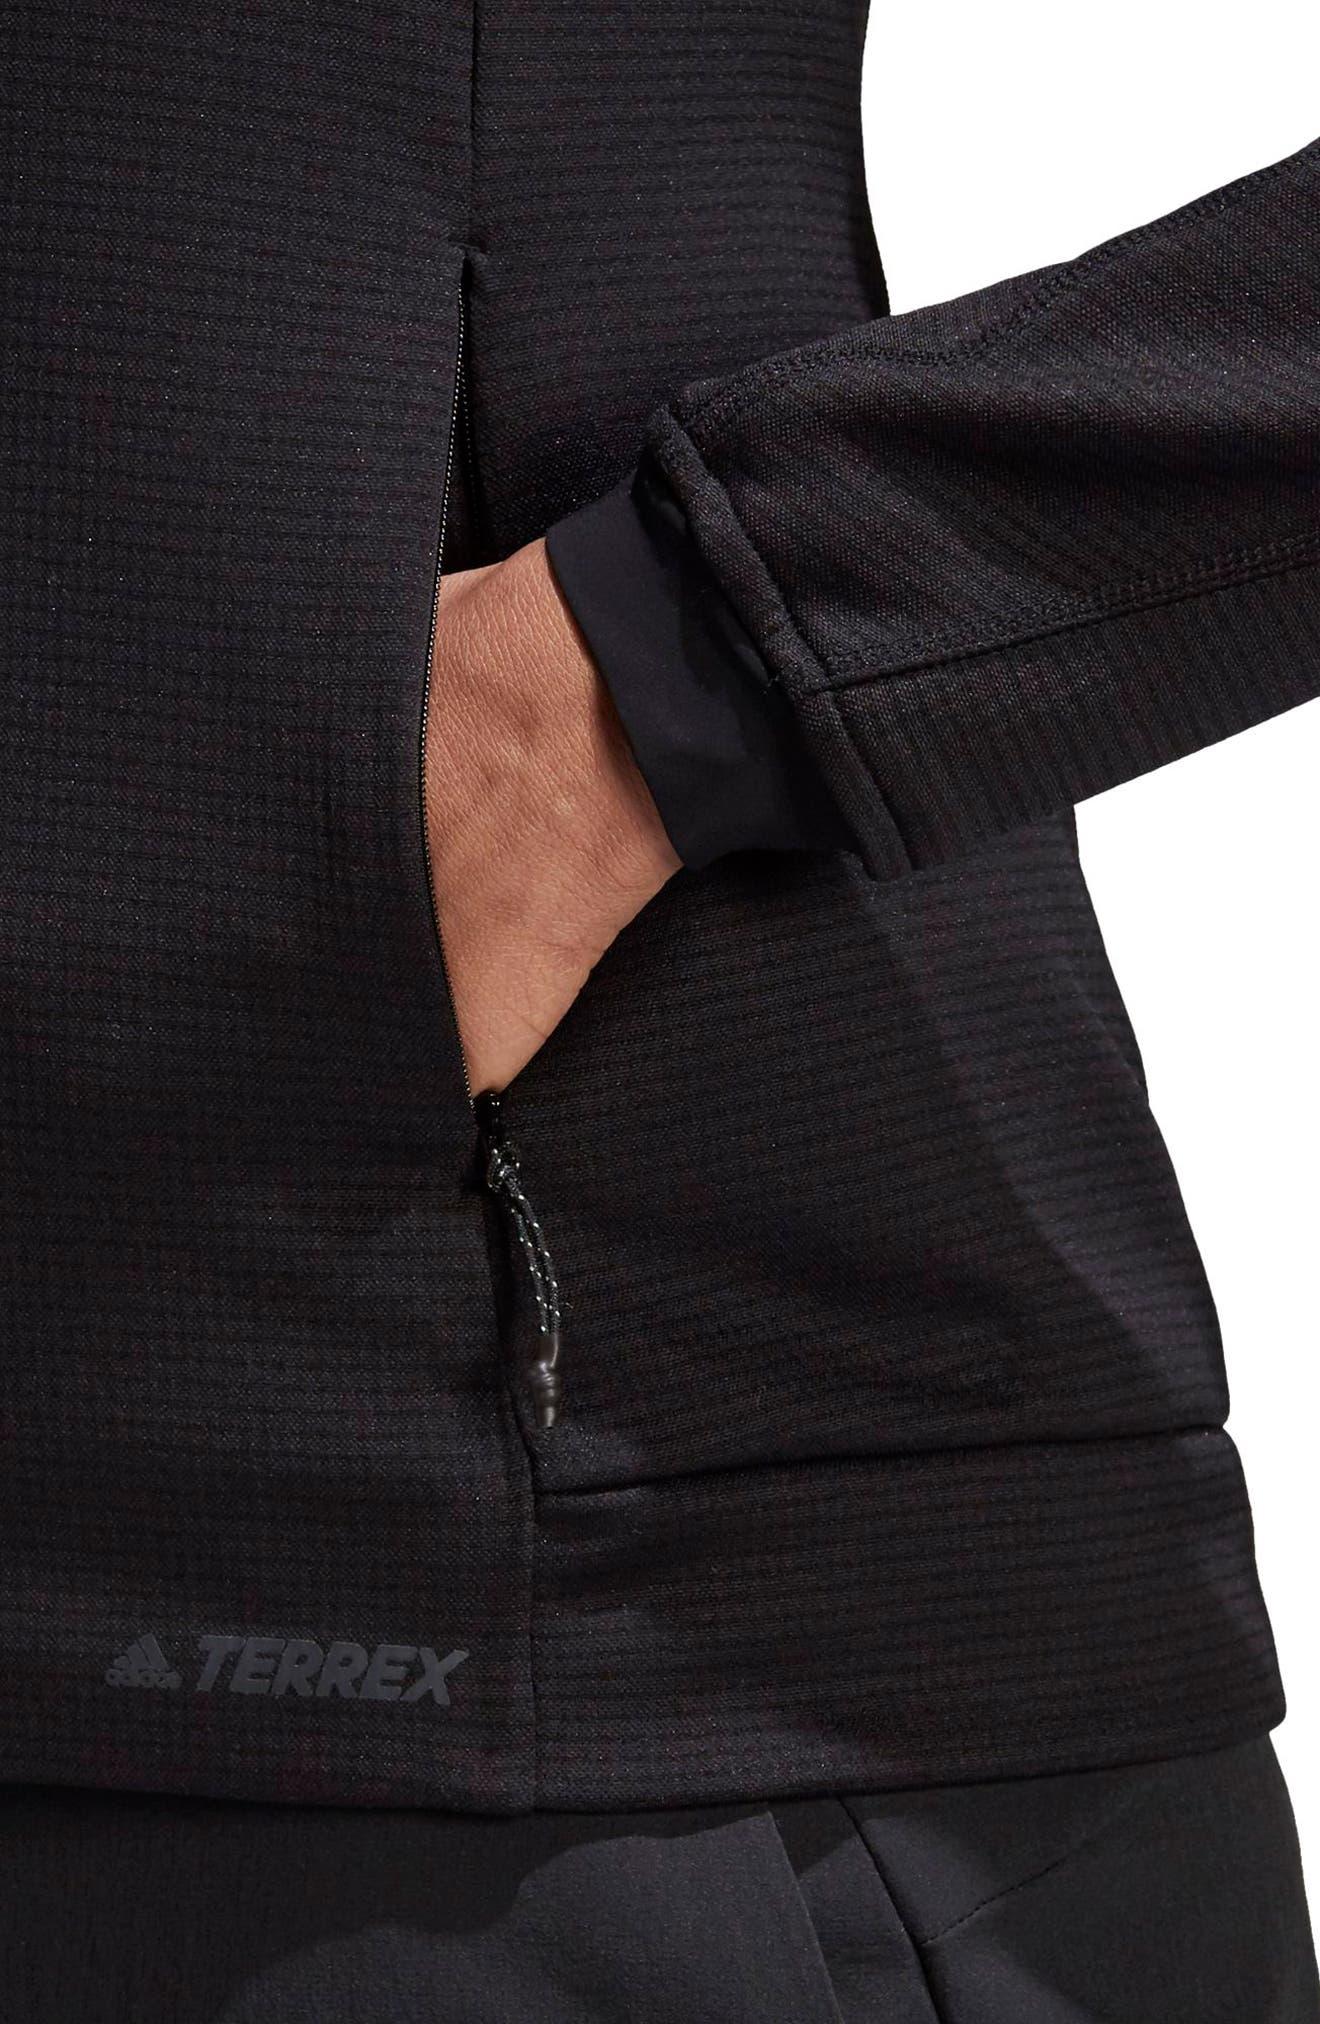 ADIDAS, Stockhorn Fleece Jacket, Alternate thumbnail 5, color, BLACK